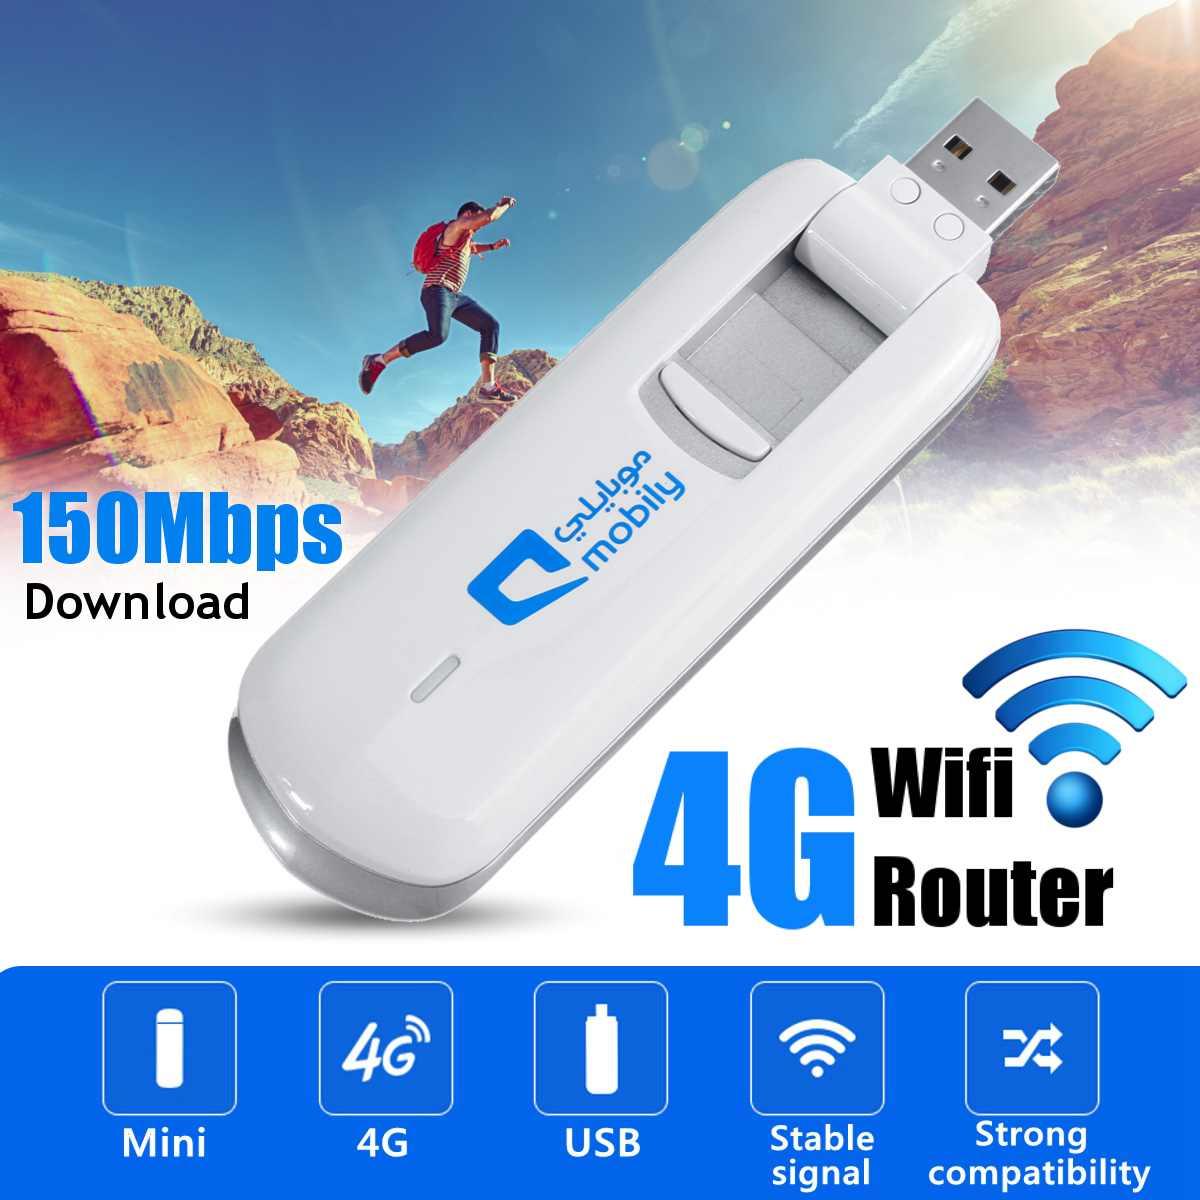 4G Wifi Router Mini Router 3G 4G Lte Wireless Portable Pocket Wi Fi Mobile Hotspot Car Wi-fi Router